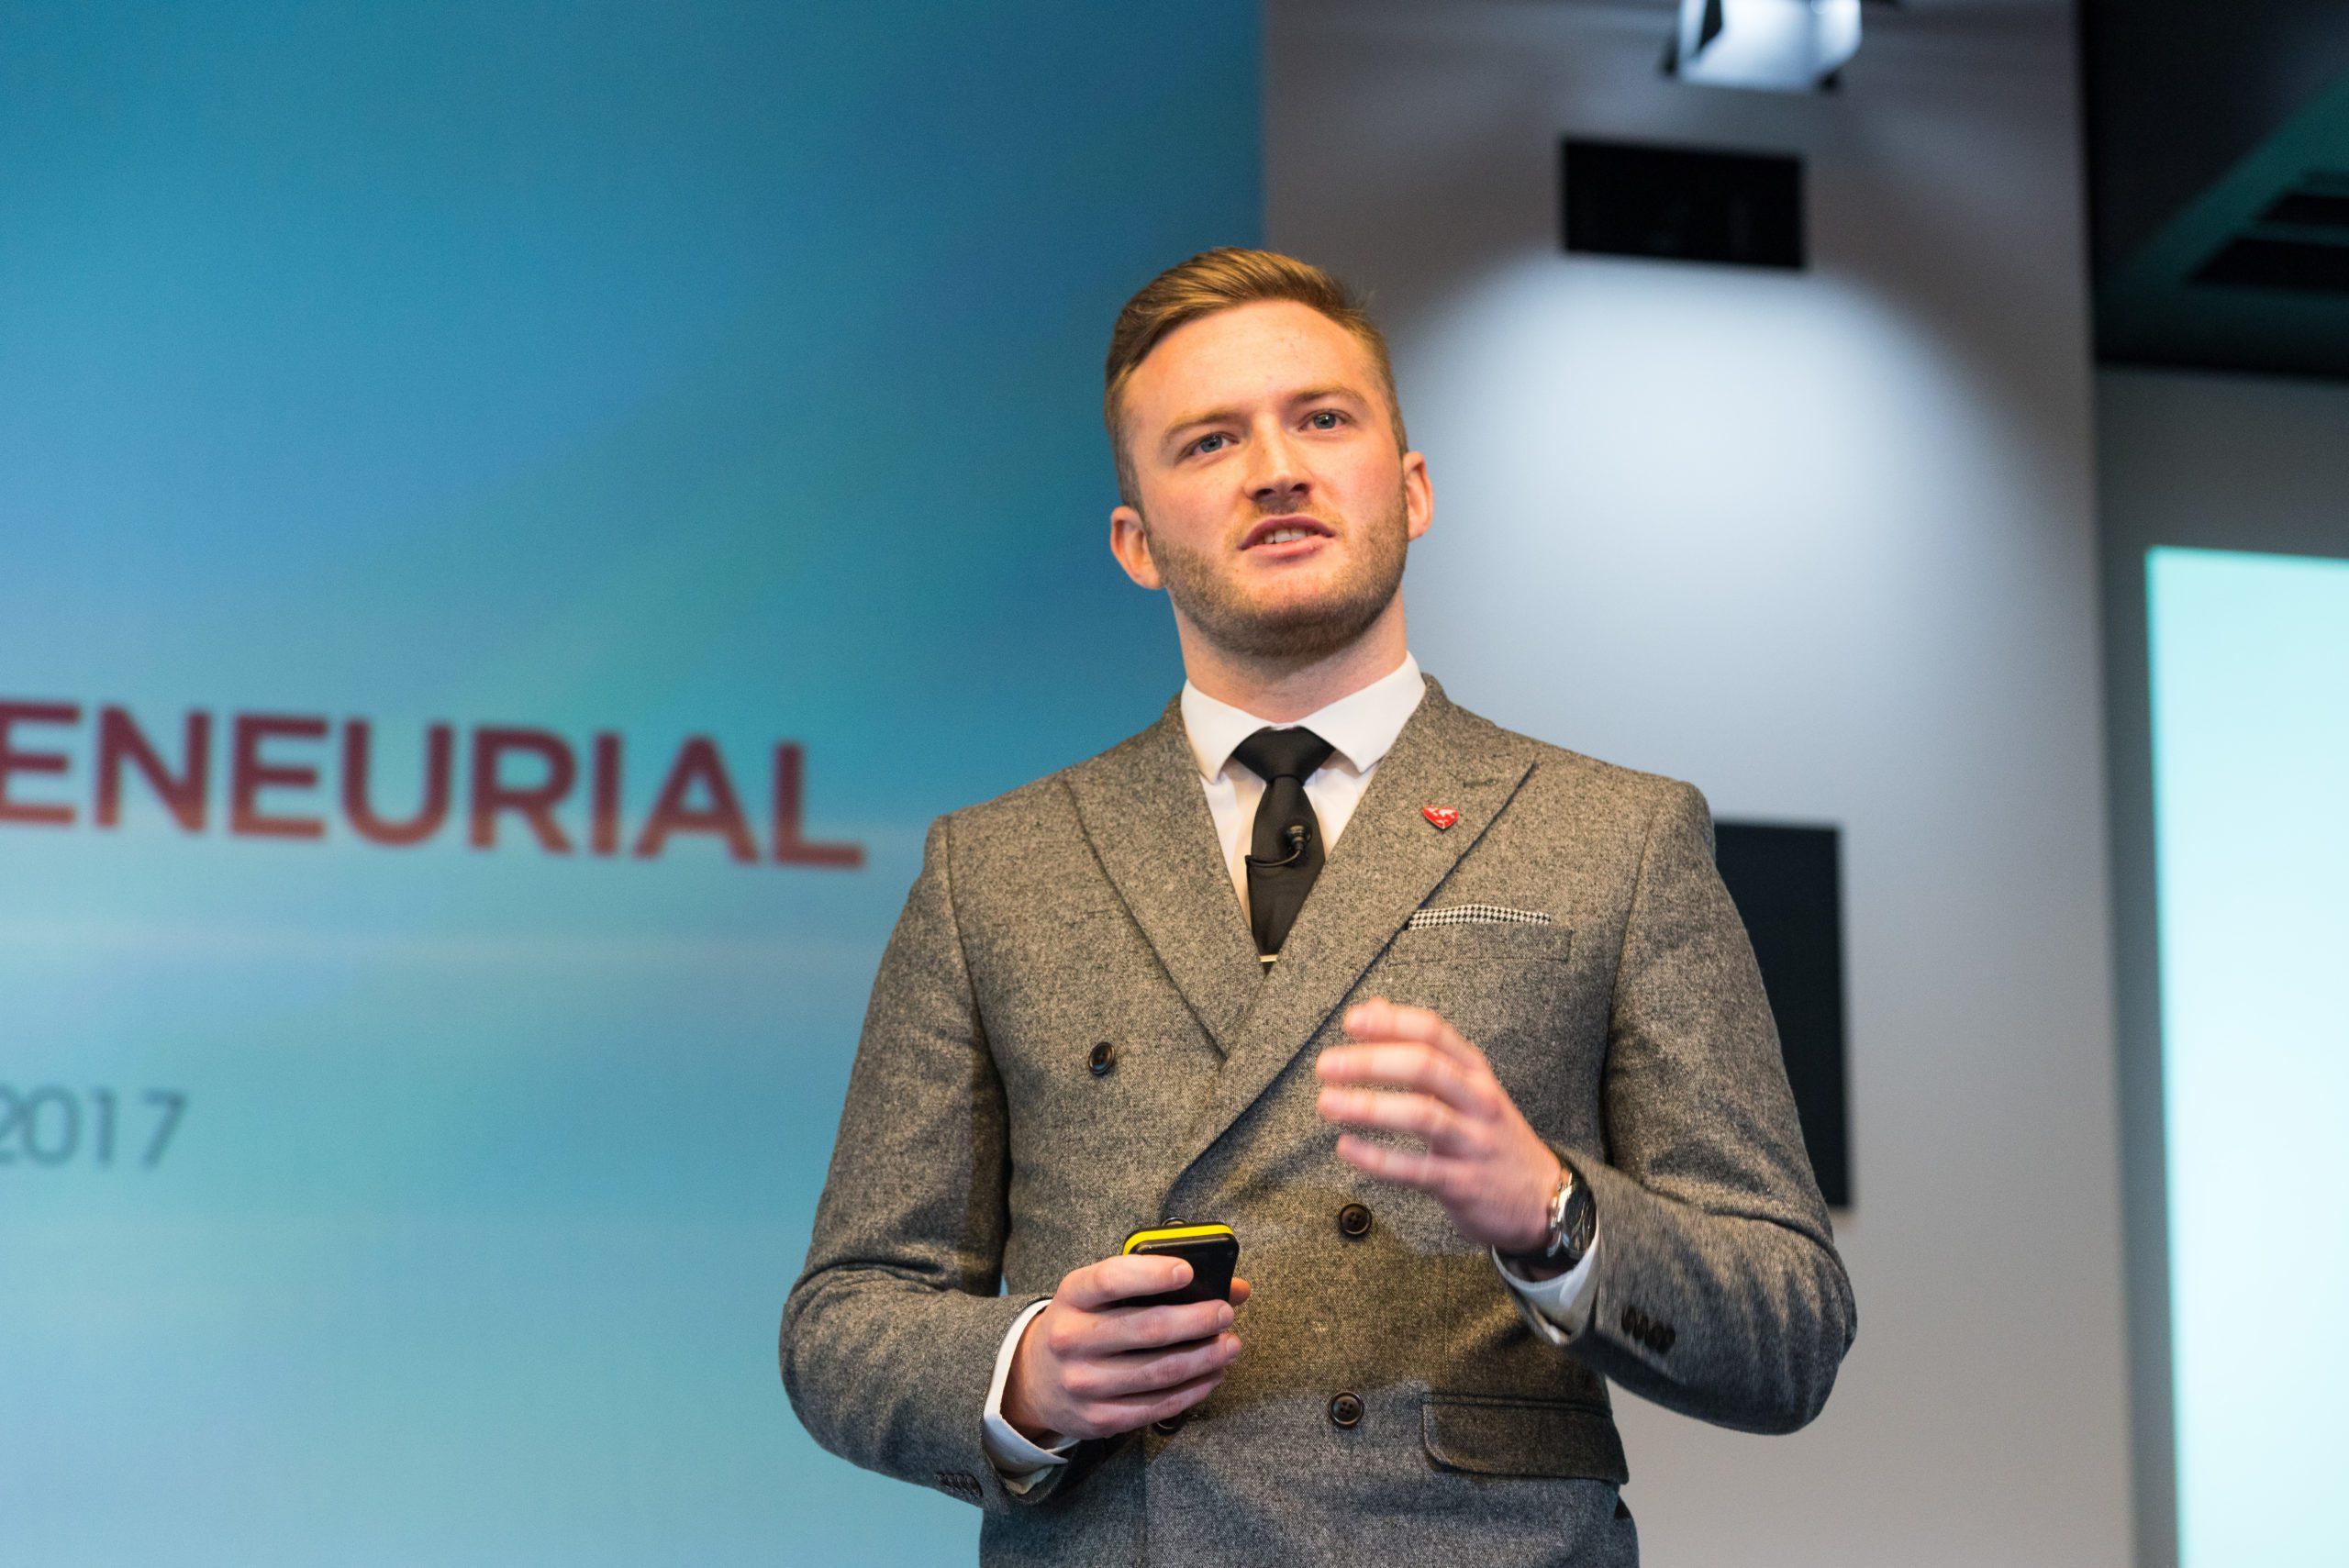 Kris Bryson mid-presentation on a stage